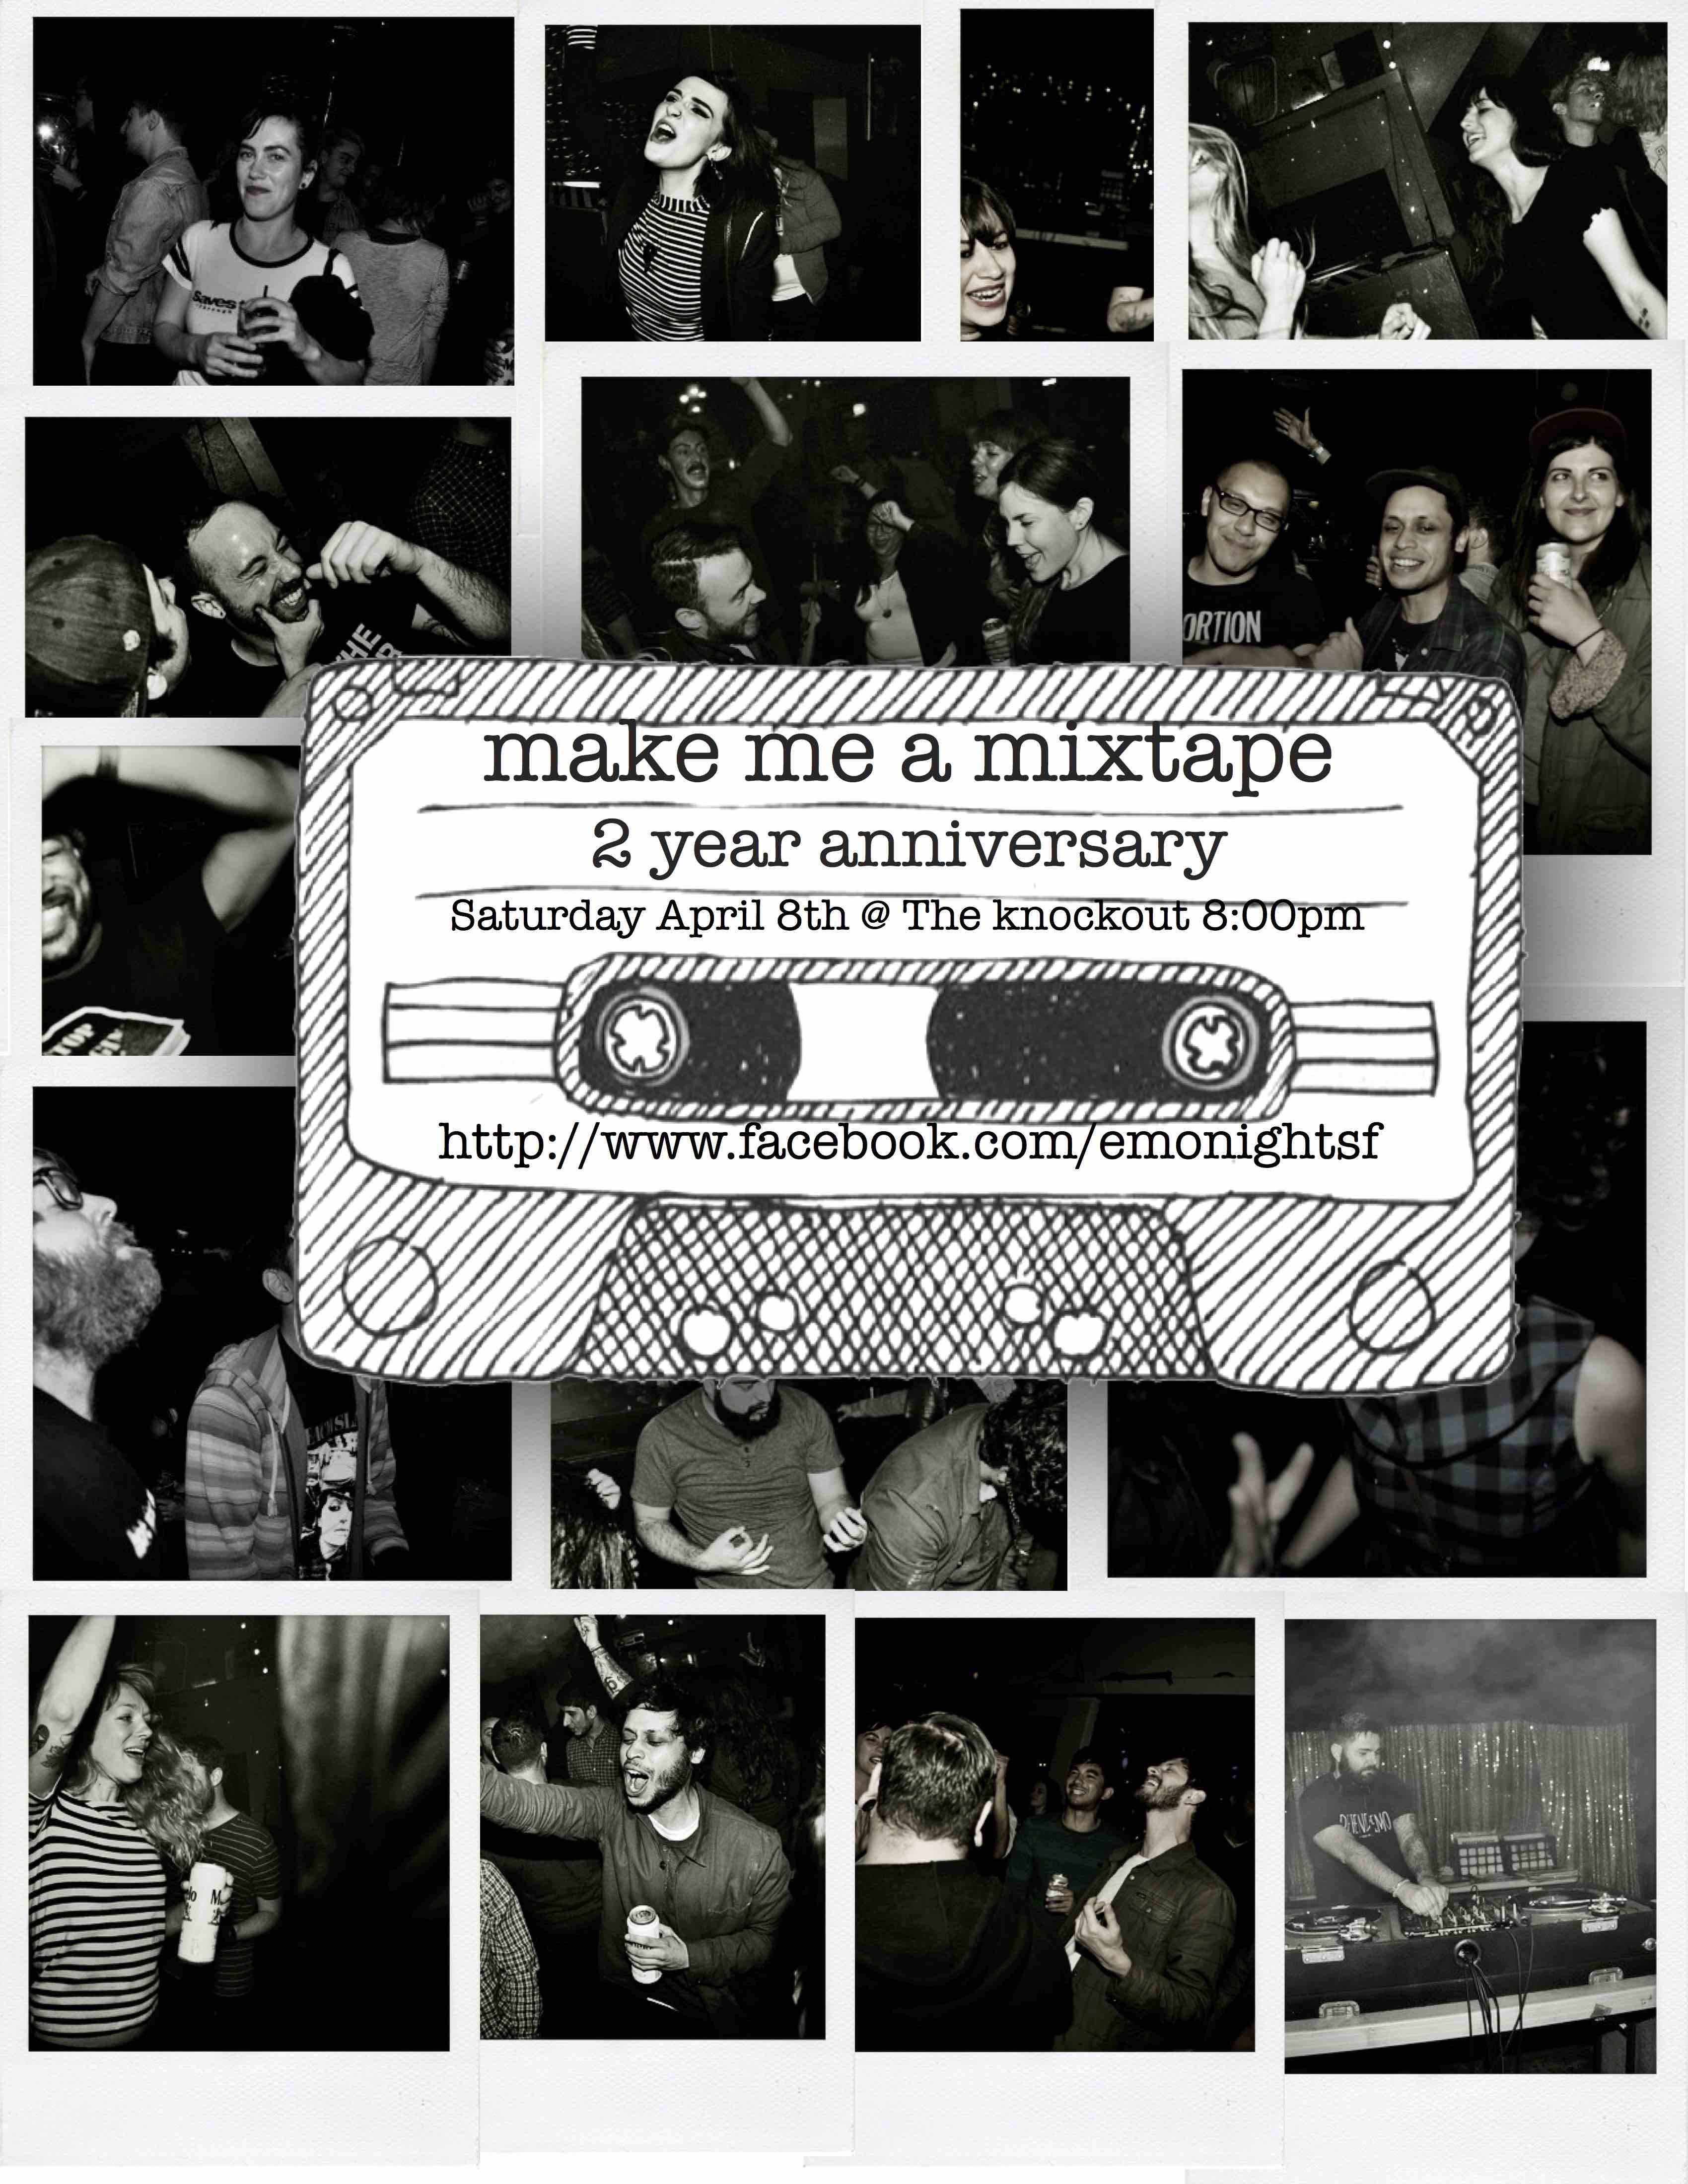 Emonight SF - 2nd year anniversary Make me a mixtape at The